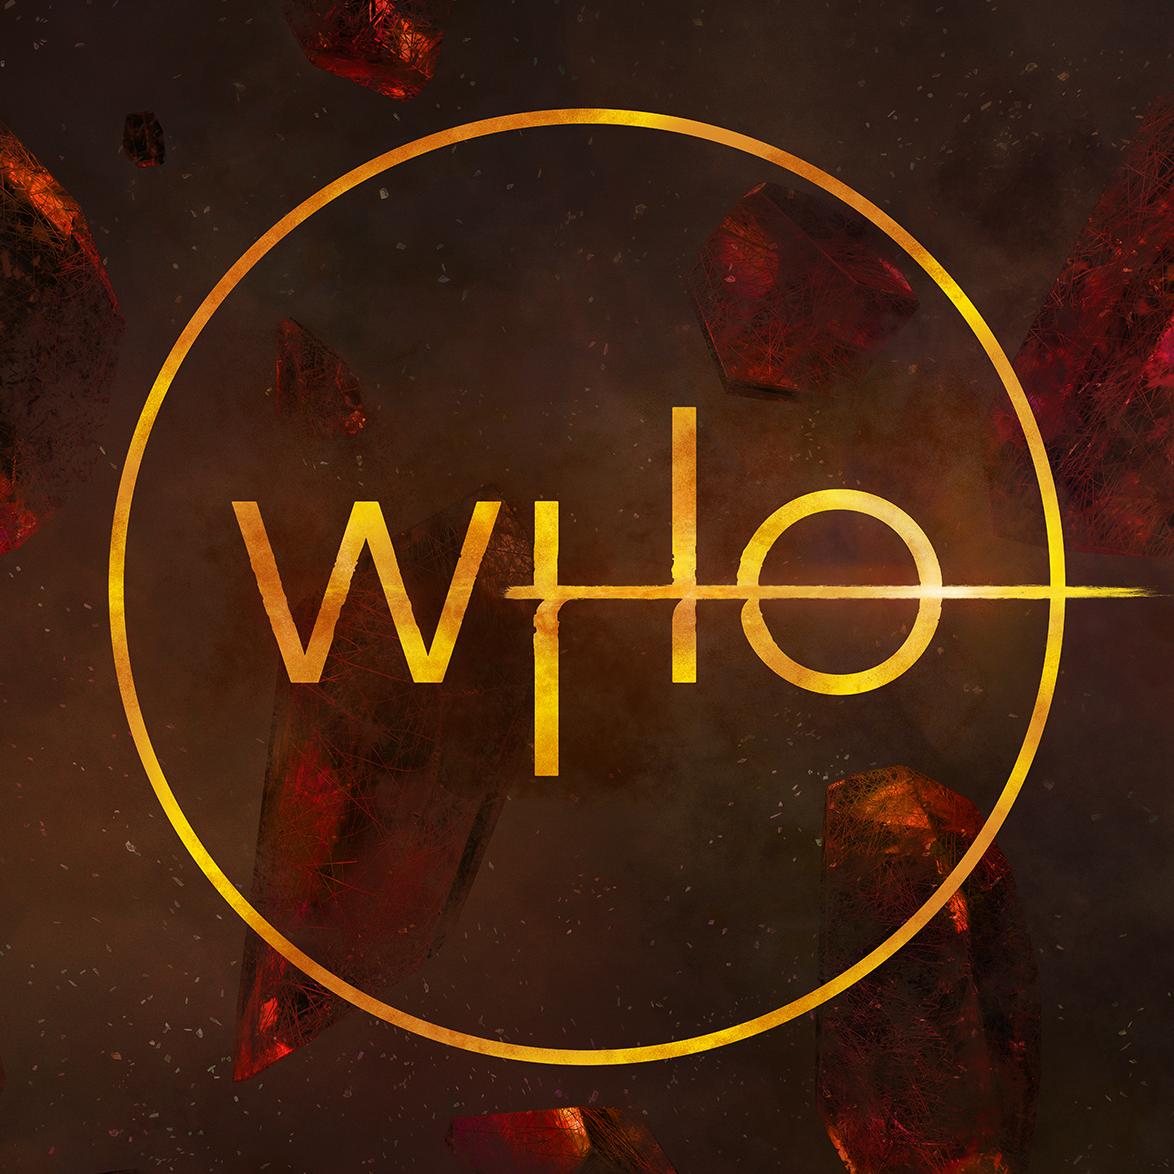 doctorwho's avatar